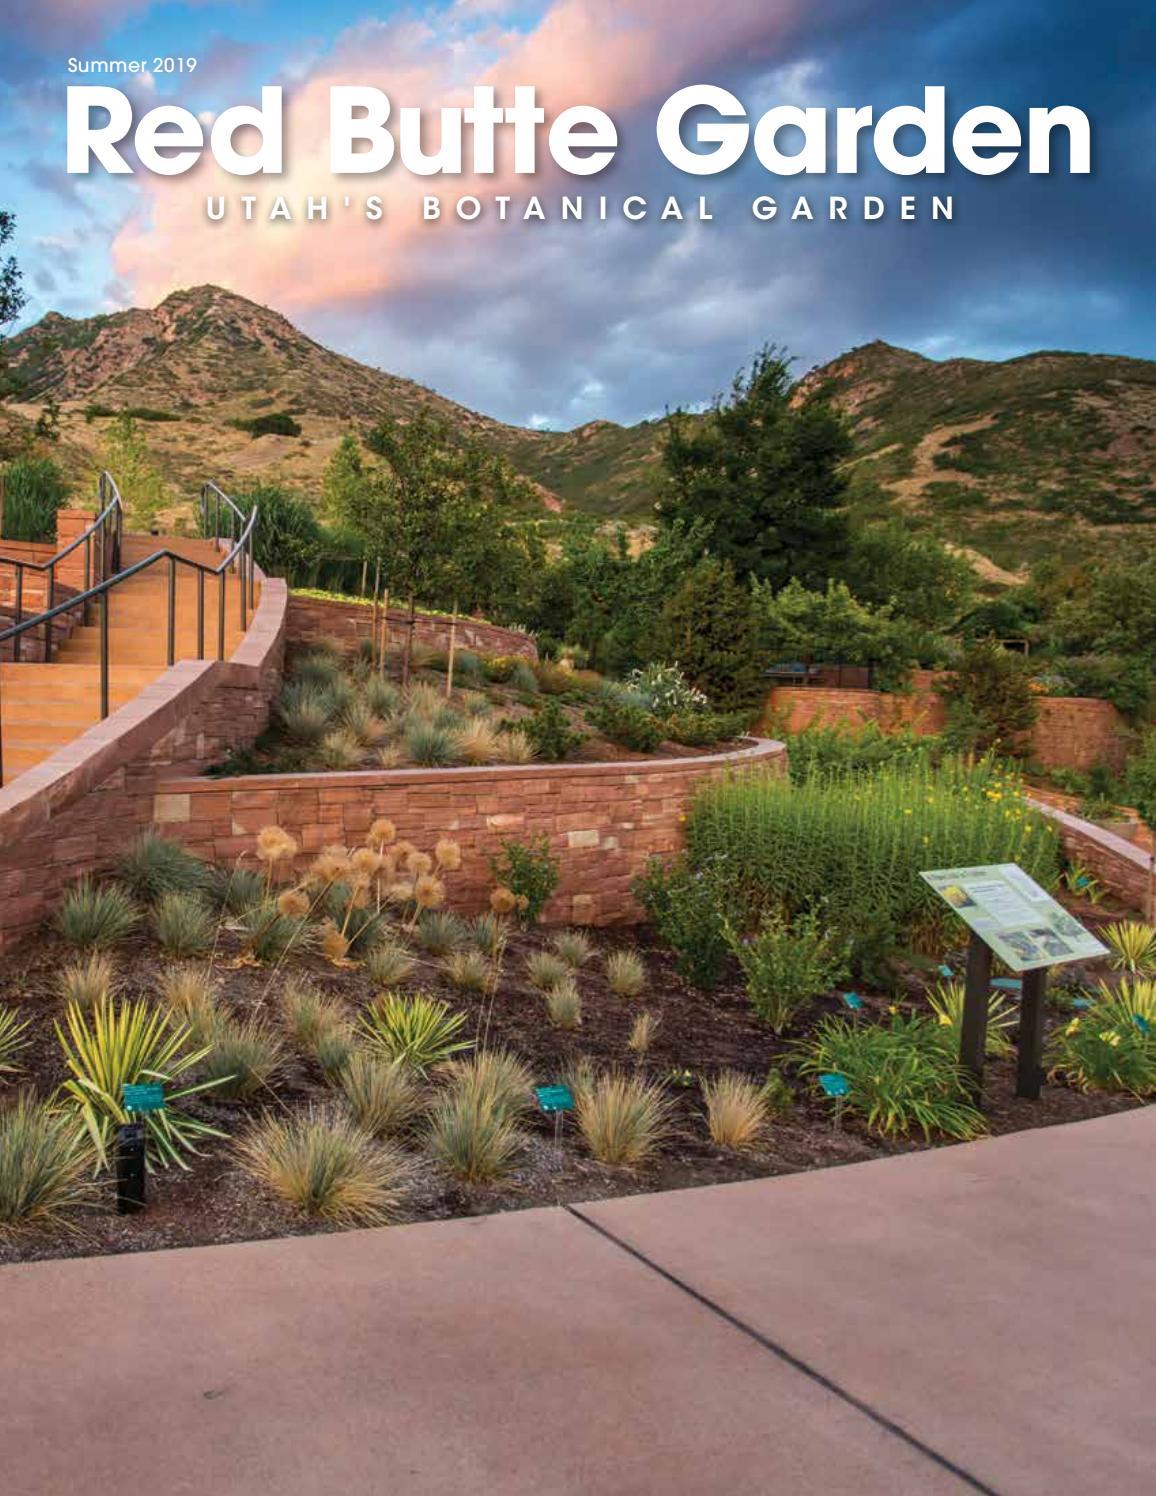 Red Butte Garden Newsletter Summer 2019 By Red Butte Garden Issuu